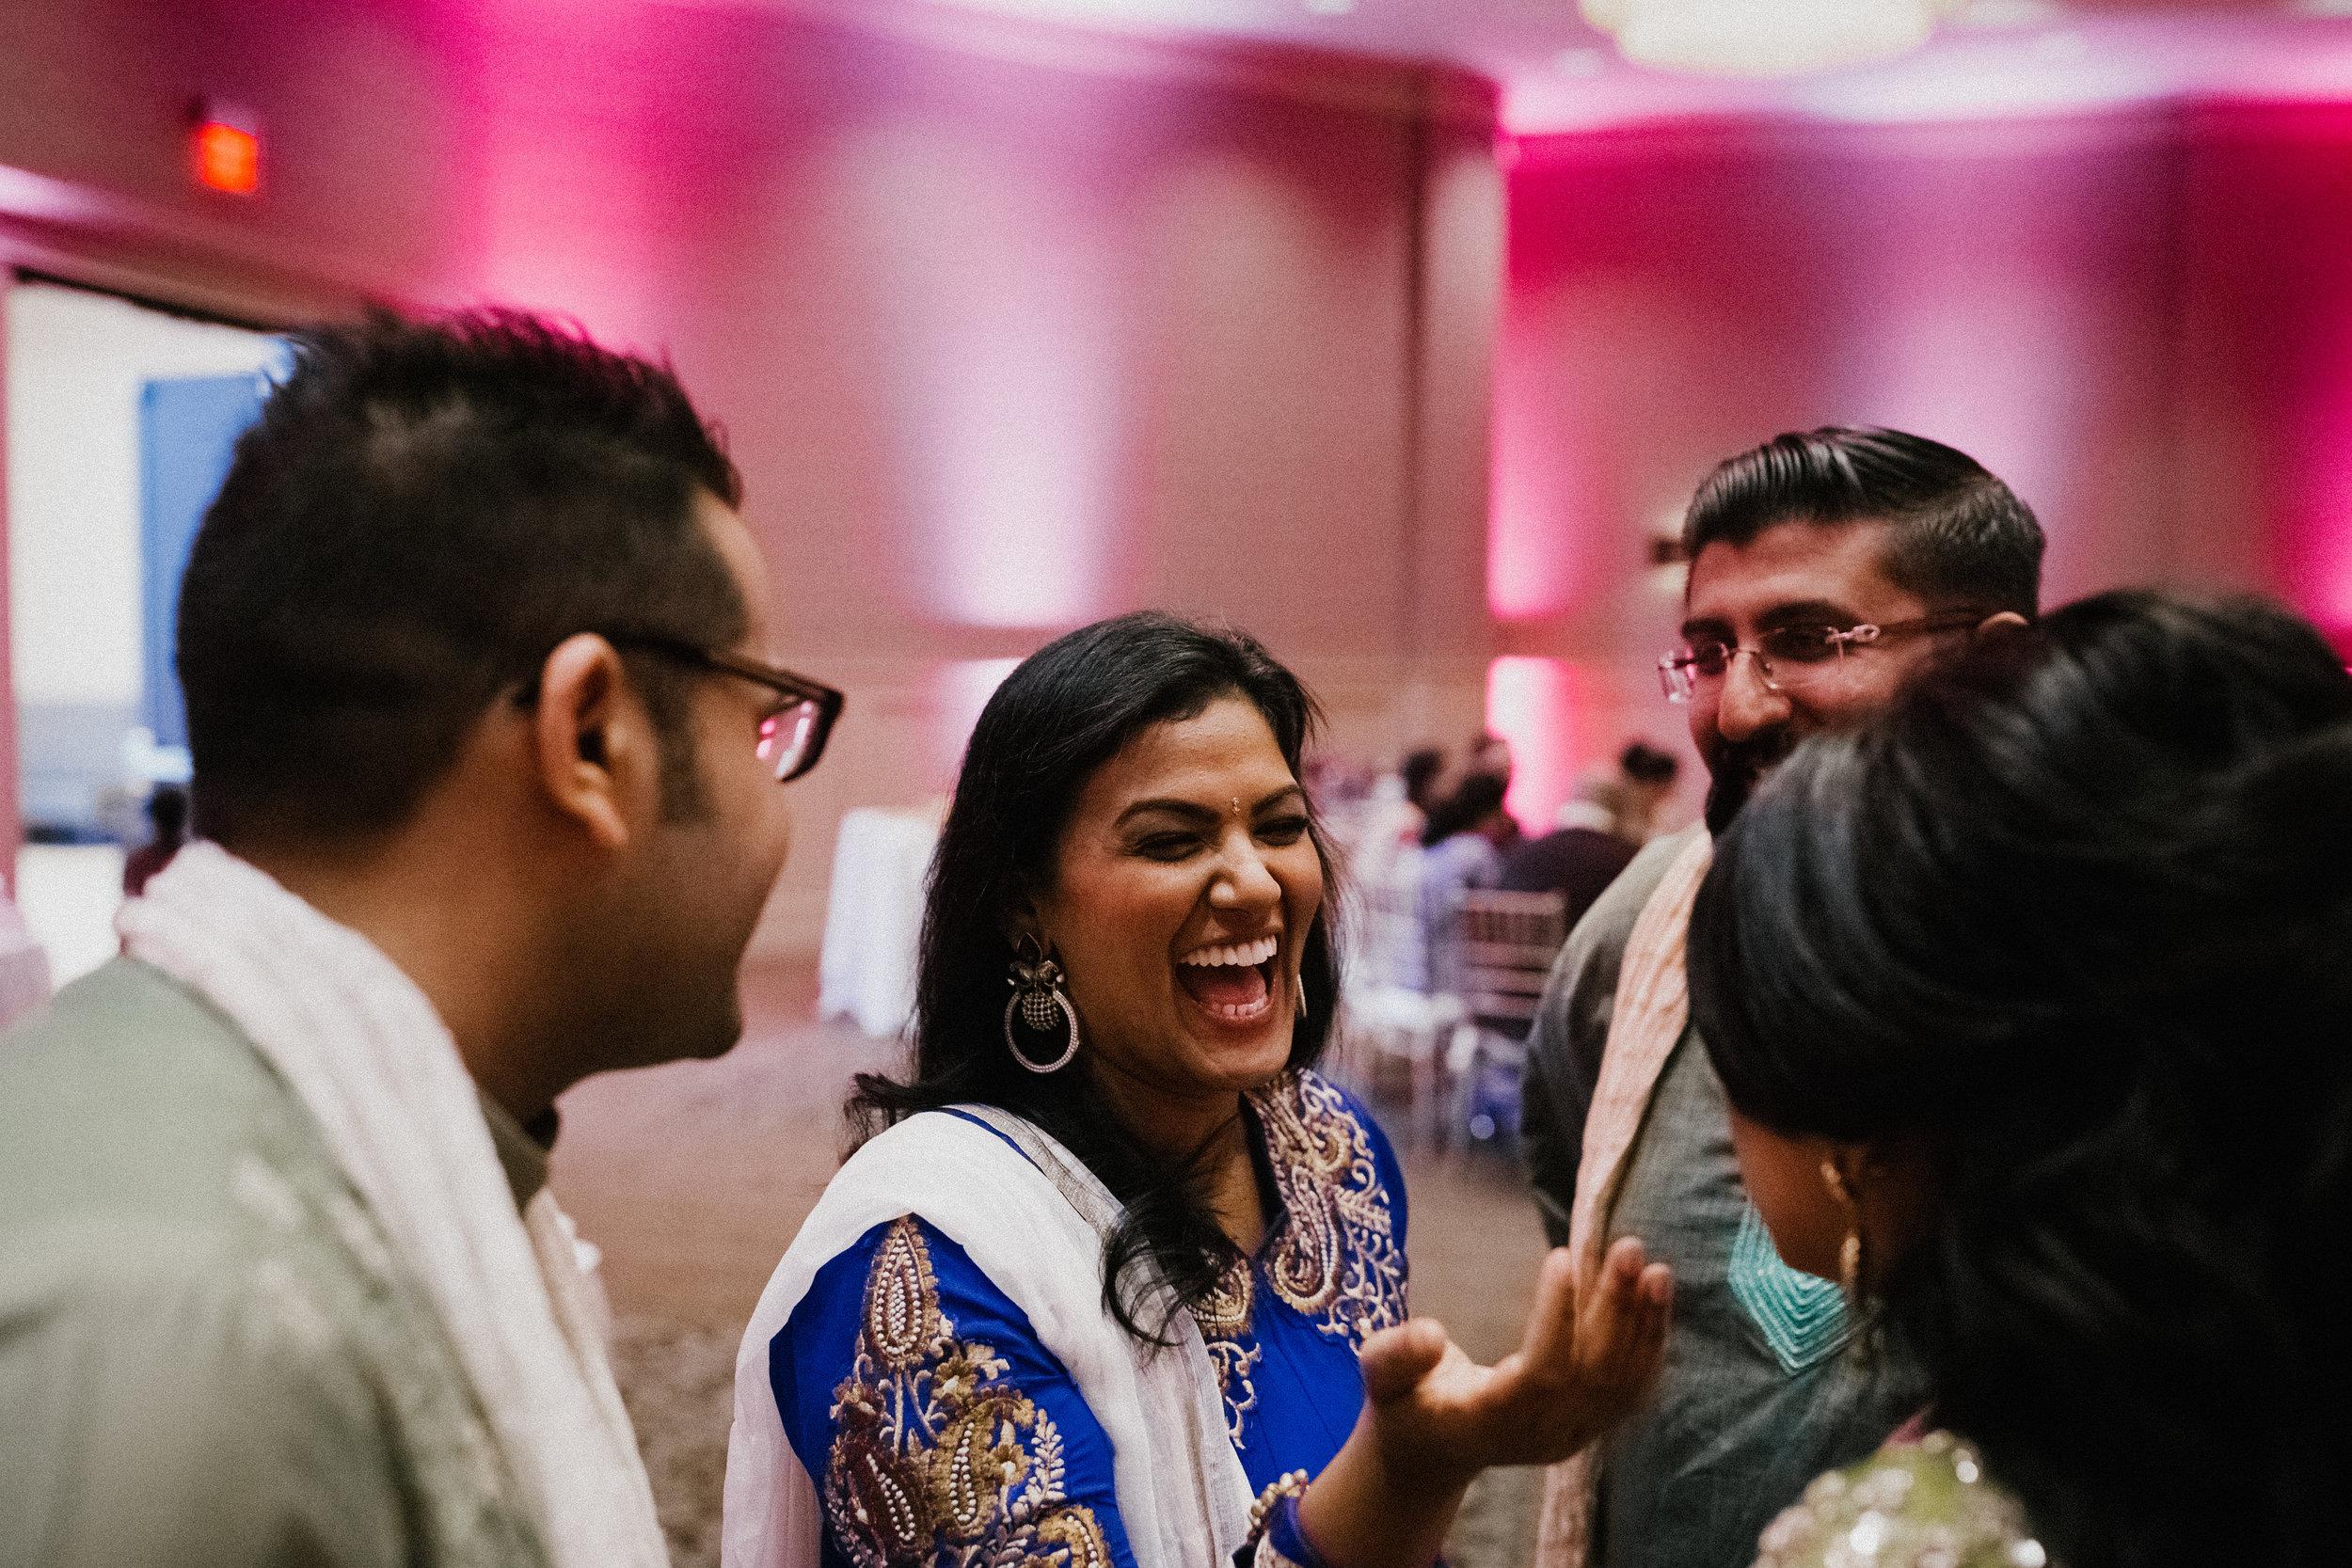 Aparna-Ankit-Patel-Shah-Detroit-Michigan-Shadow-Shine-Pictures-Photography-Indian-Videographer